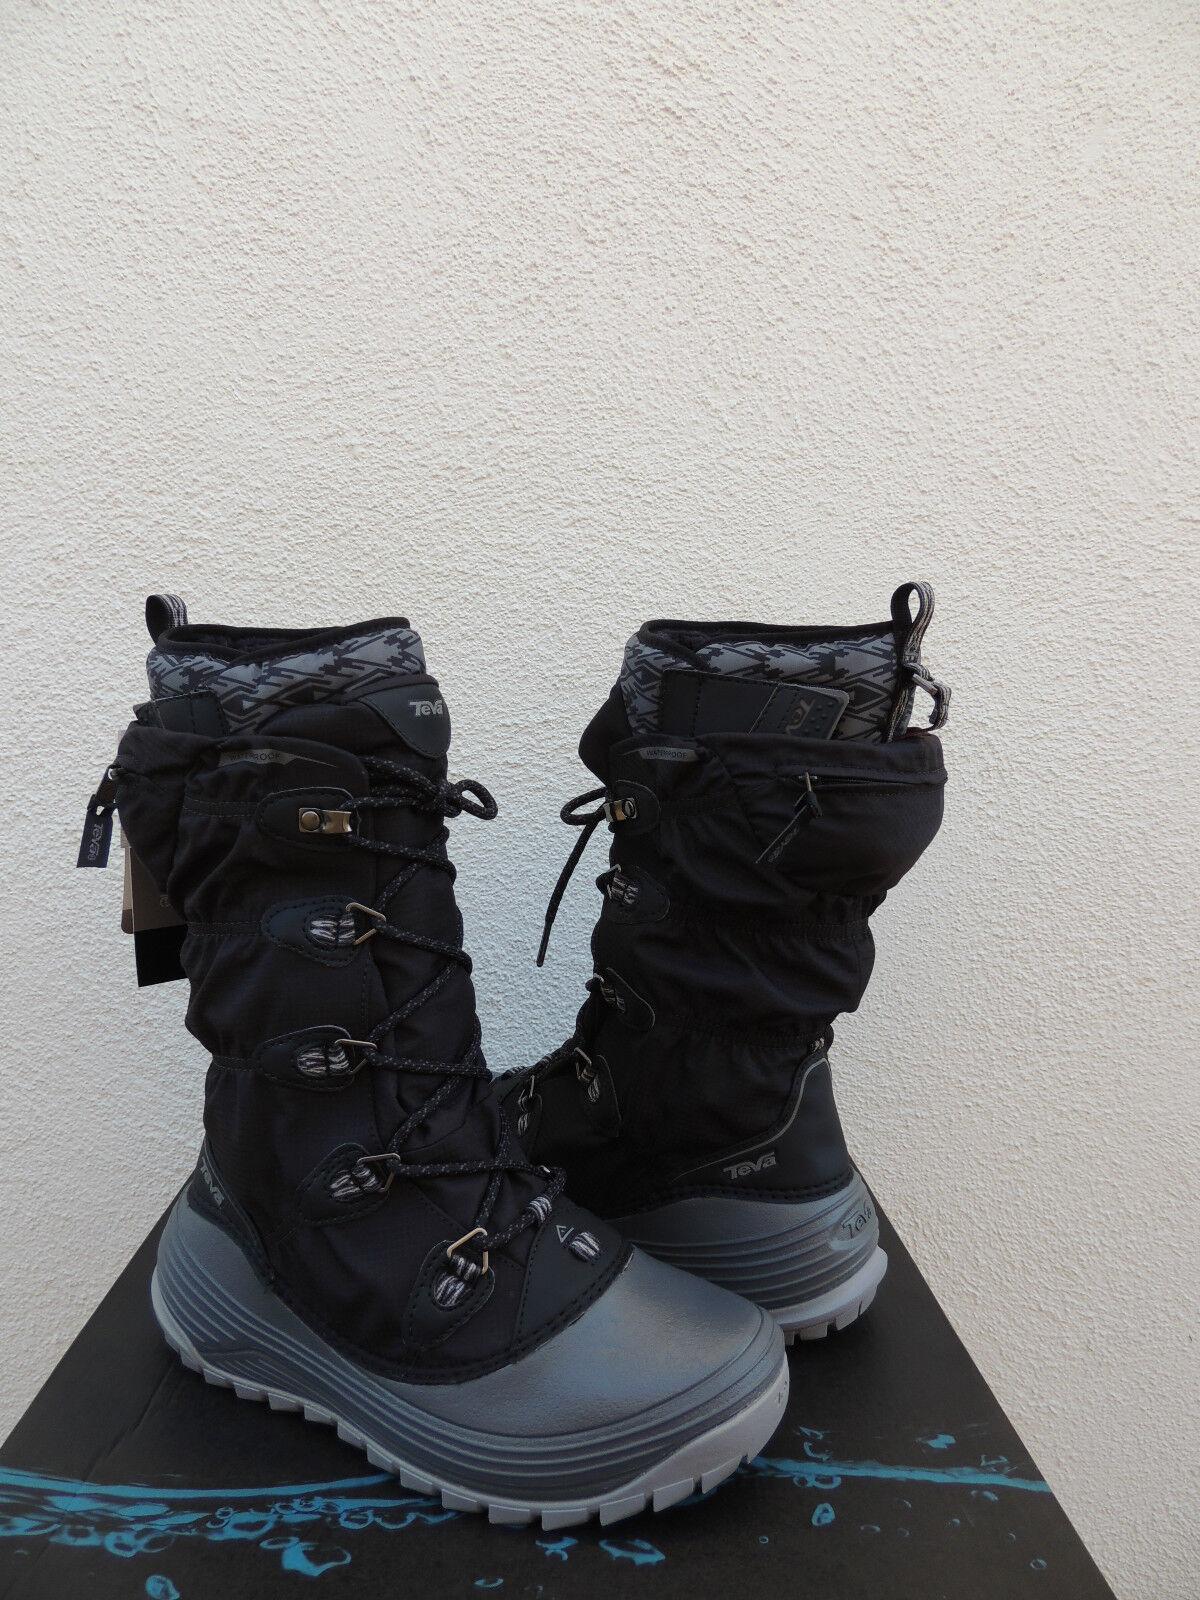 TEVA JORDANELLE 3 BLACK WATER PROOF THINSULATE WINTER BOOTS, US 6/ ~NIB